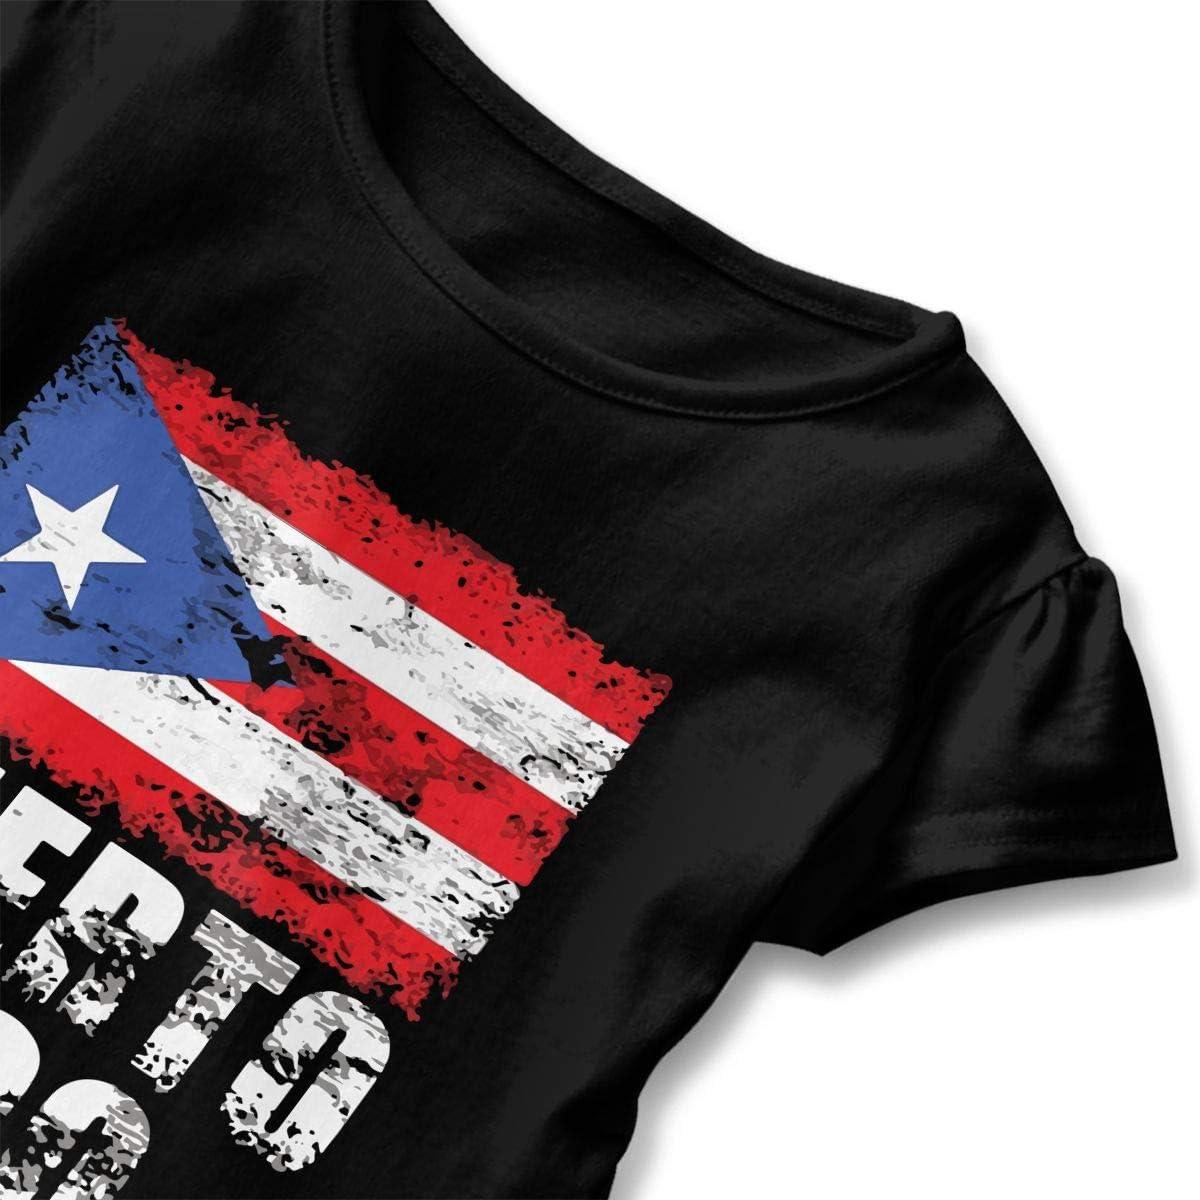 Cheng Jian Bo Distressed Puerto Rican Flag Toddler Girls T Shirt Kids Cotton Short Sleeve Ruffle Tee